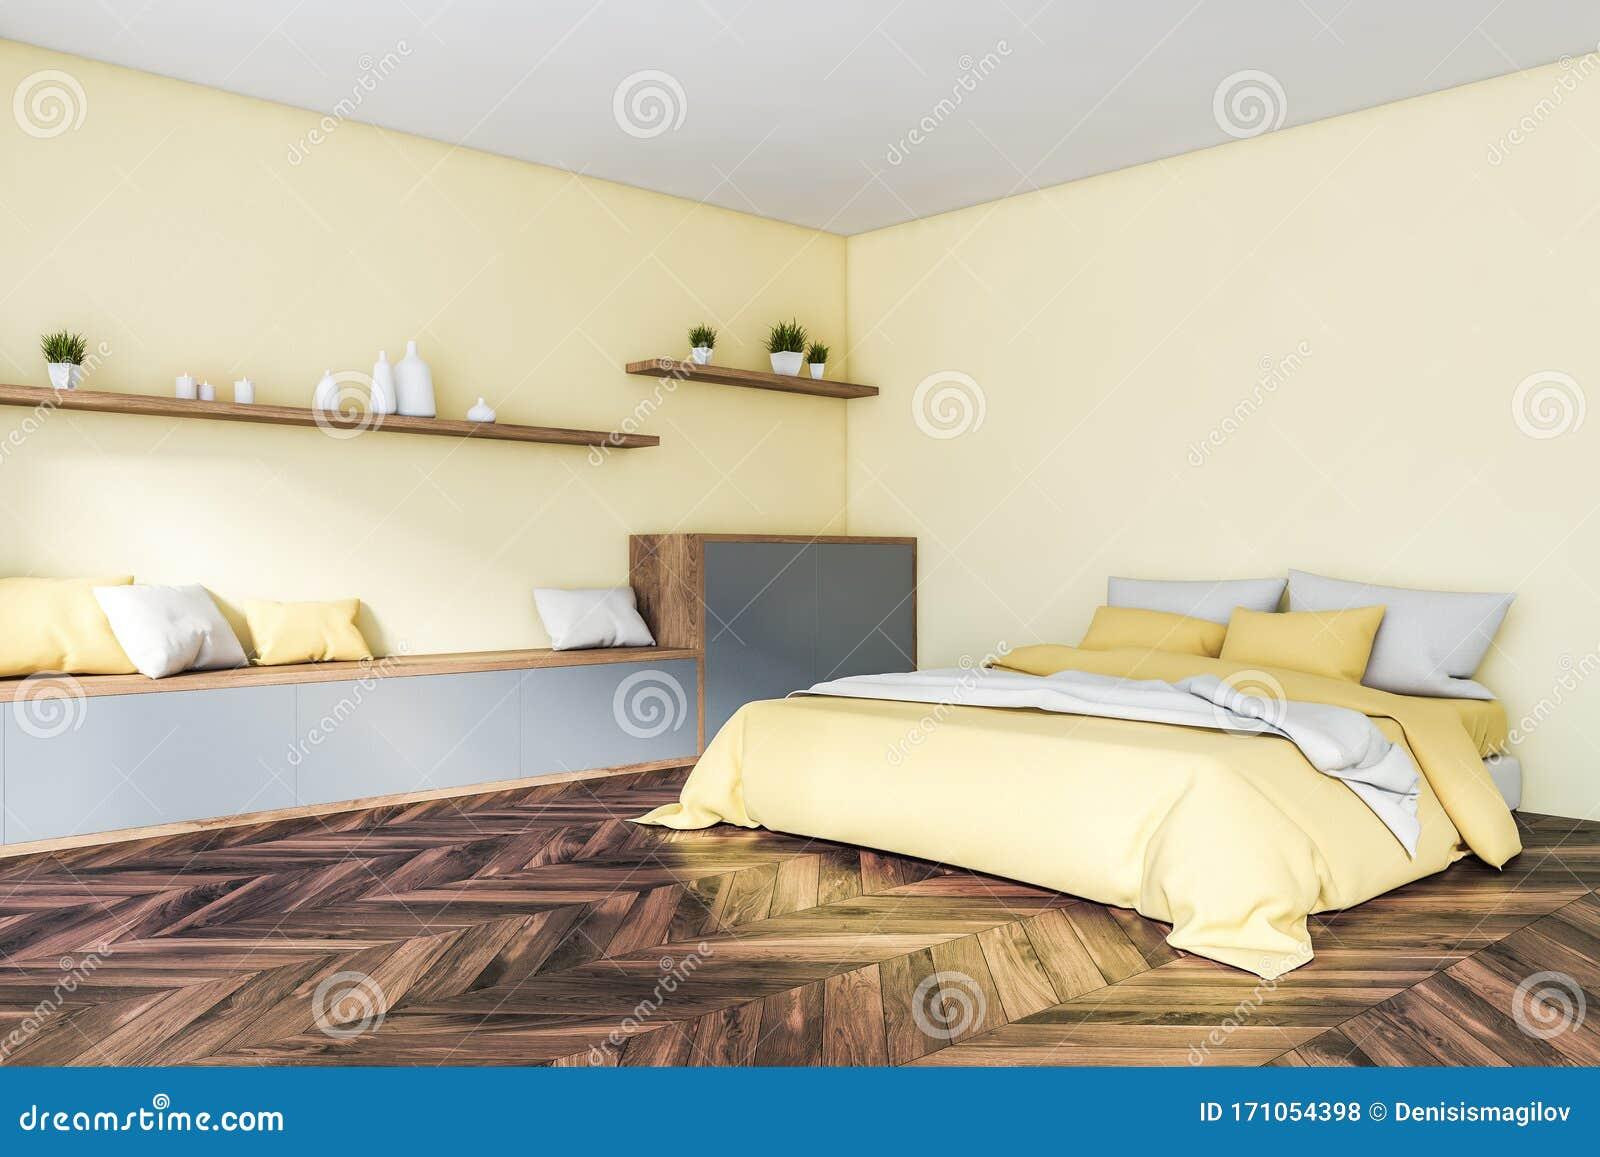 Yellow Master Bedroom Corner With Shelves Stock Illustration Illustration Of Luxury Modern 171054398